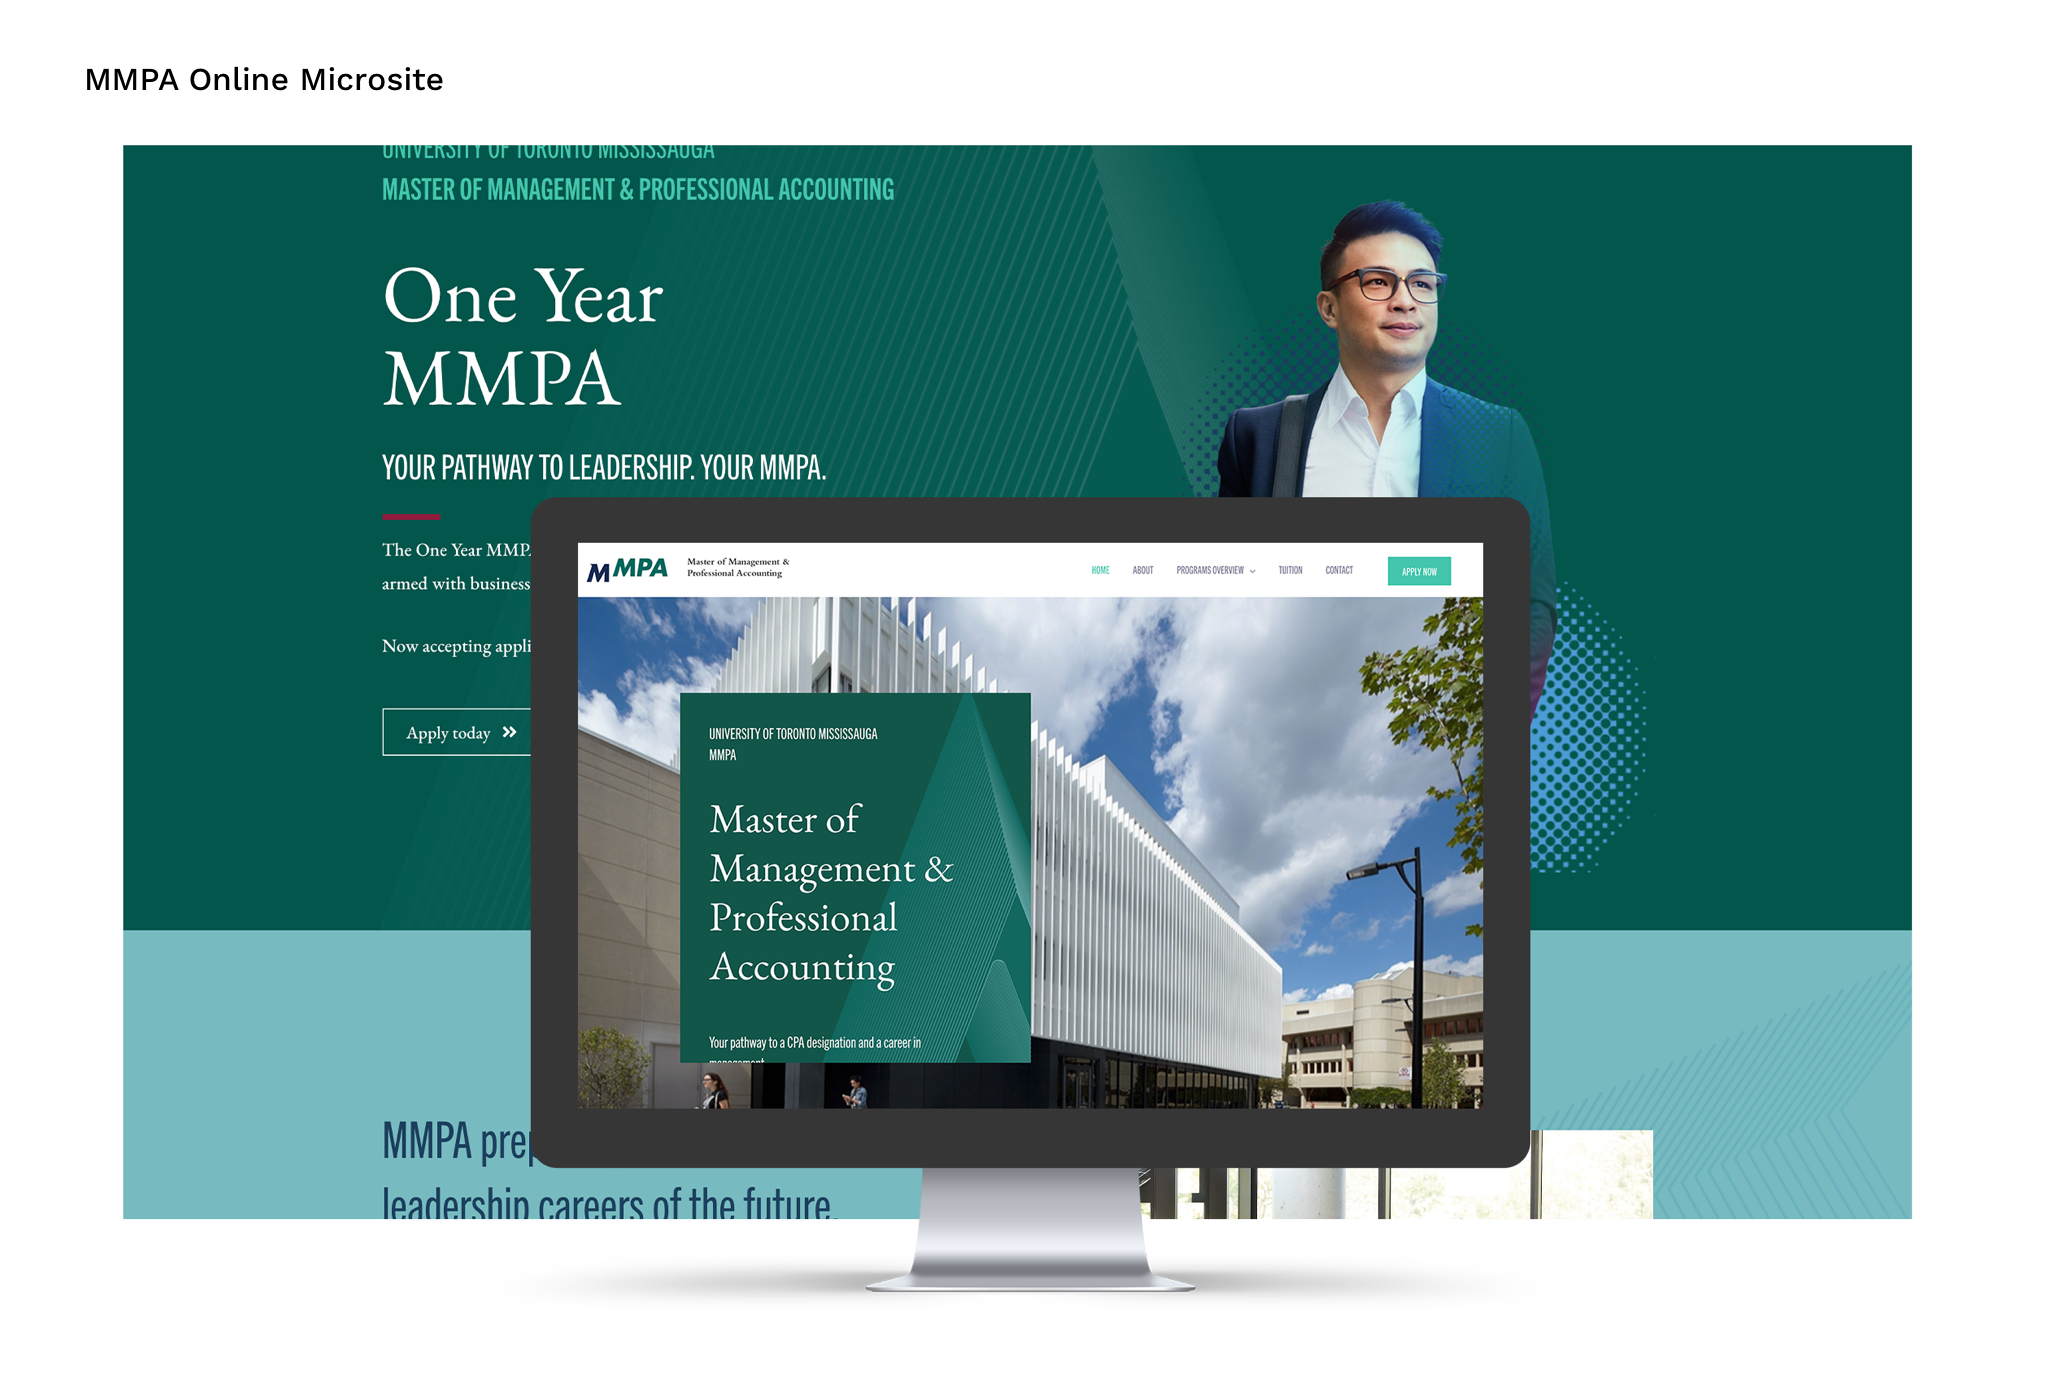 MMPA Online Microsite